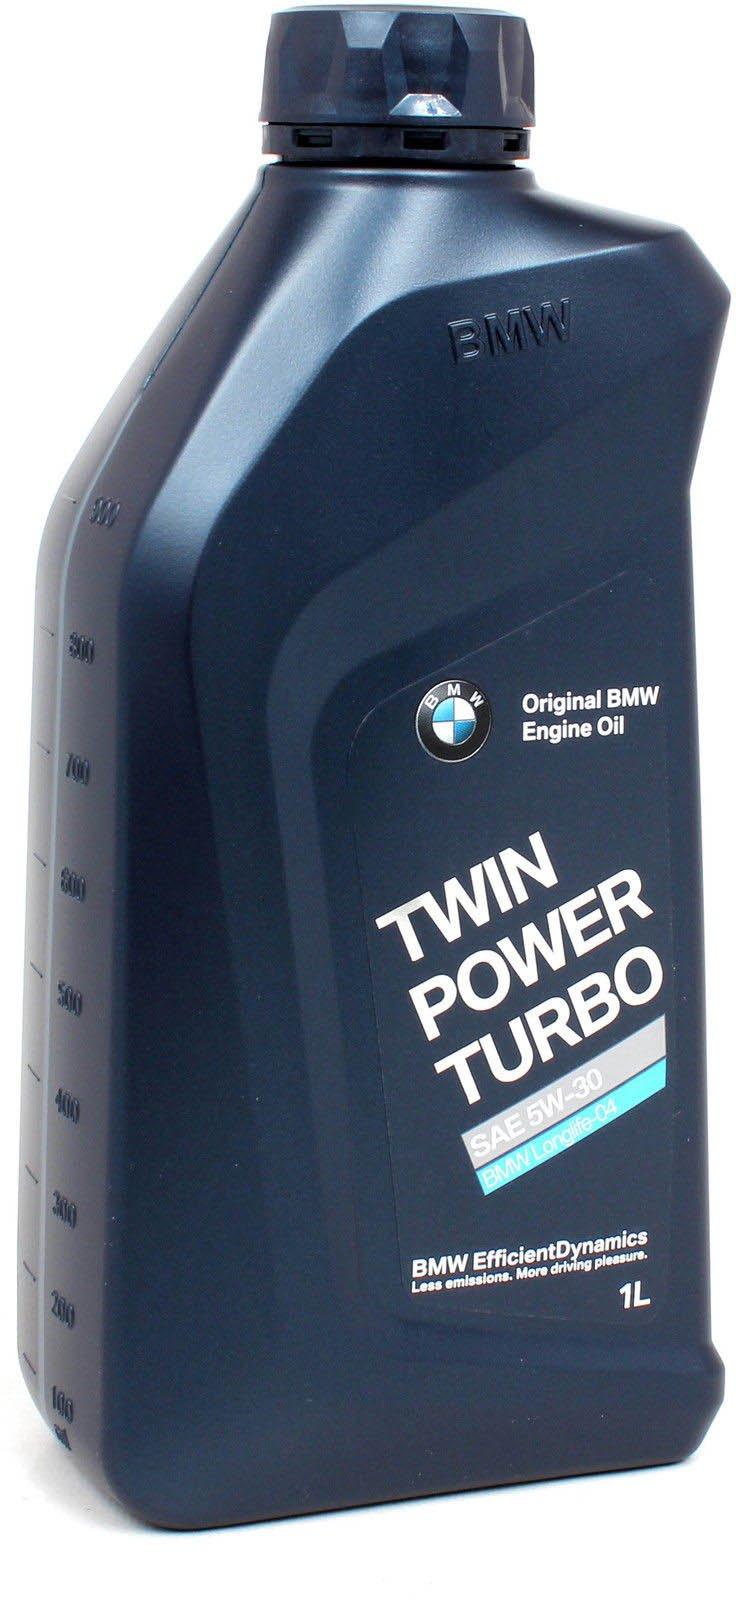 BMW TwinPower Turbo LL-04 5w-30 1л